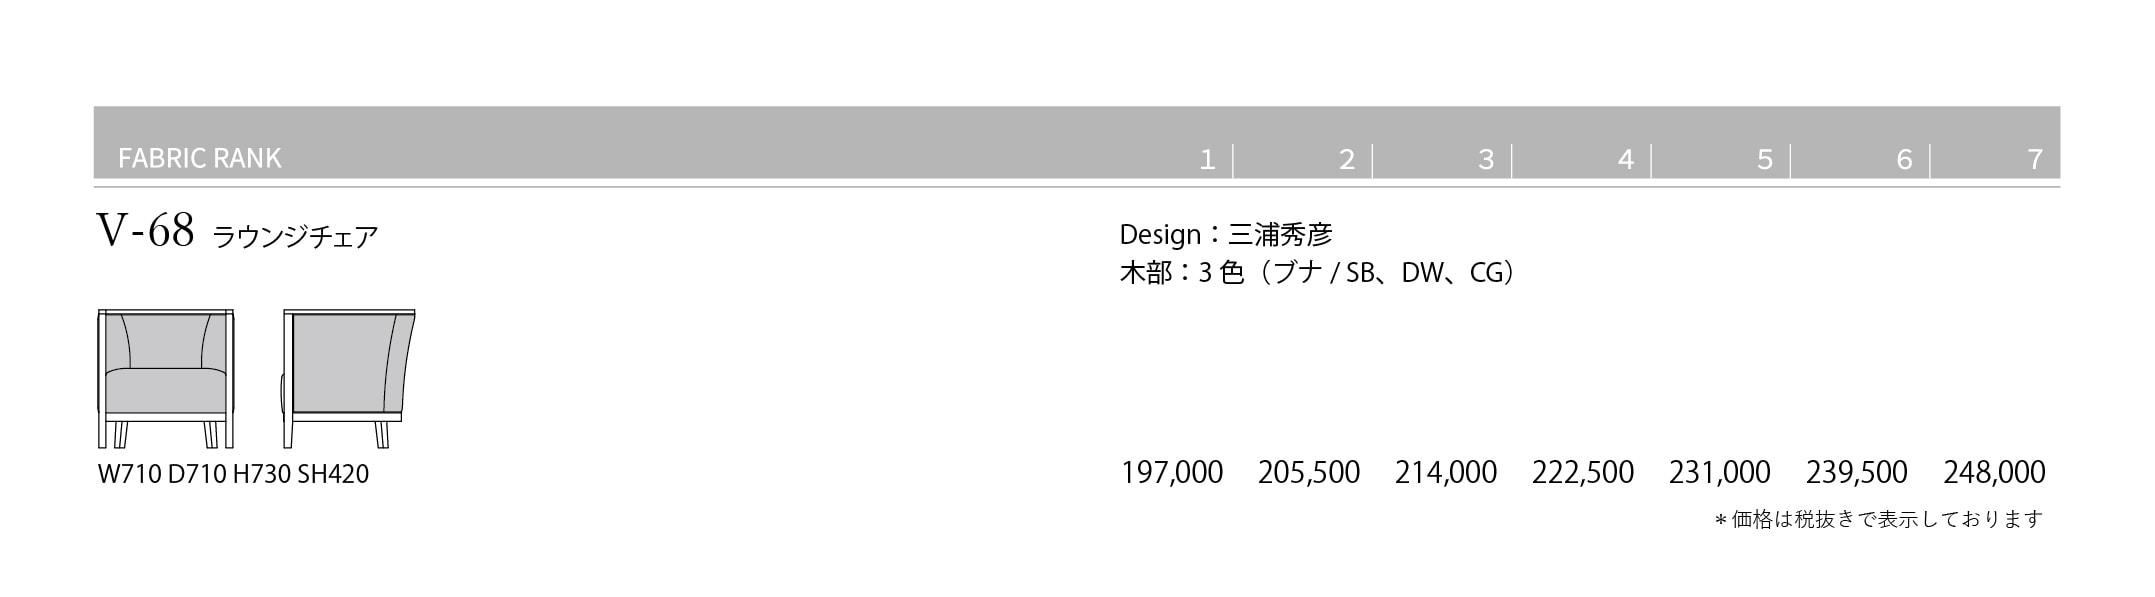 V-68 Price List